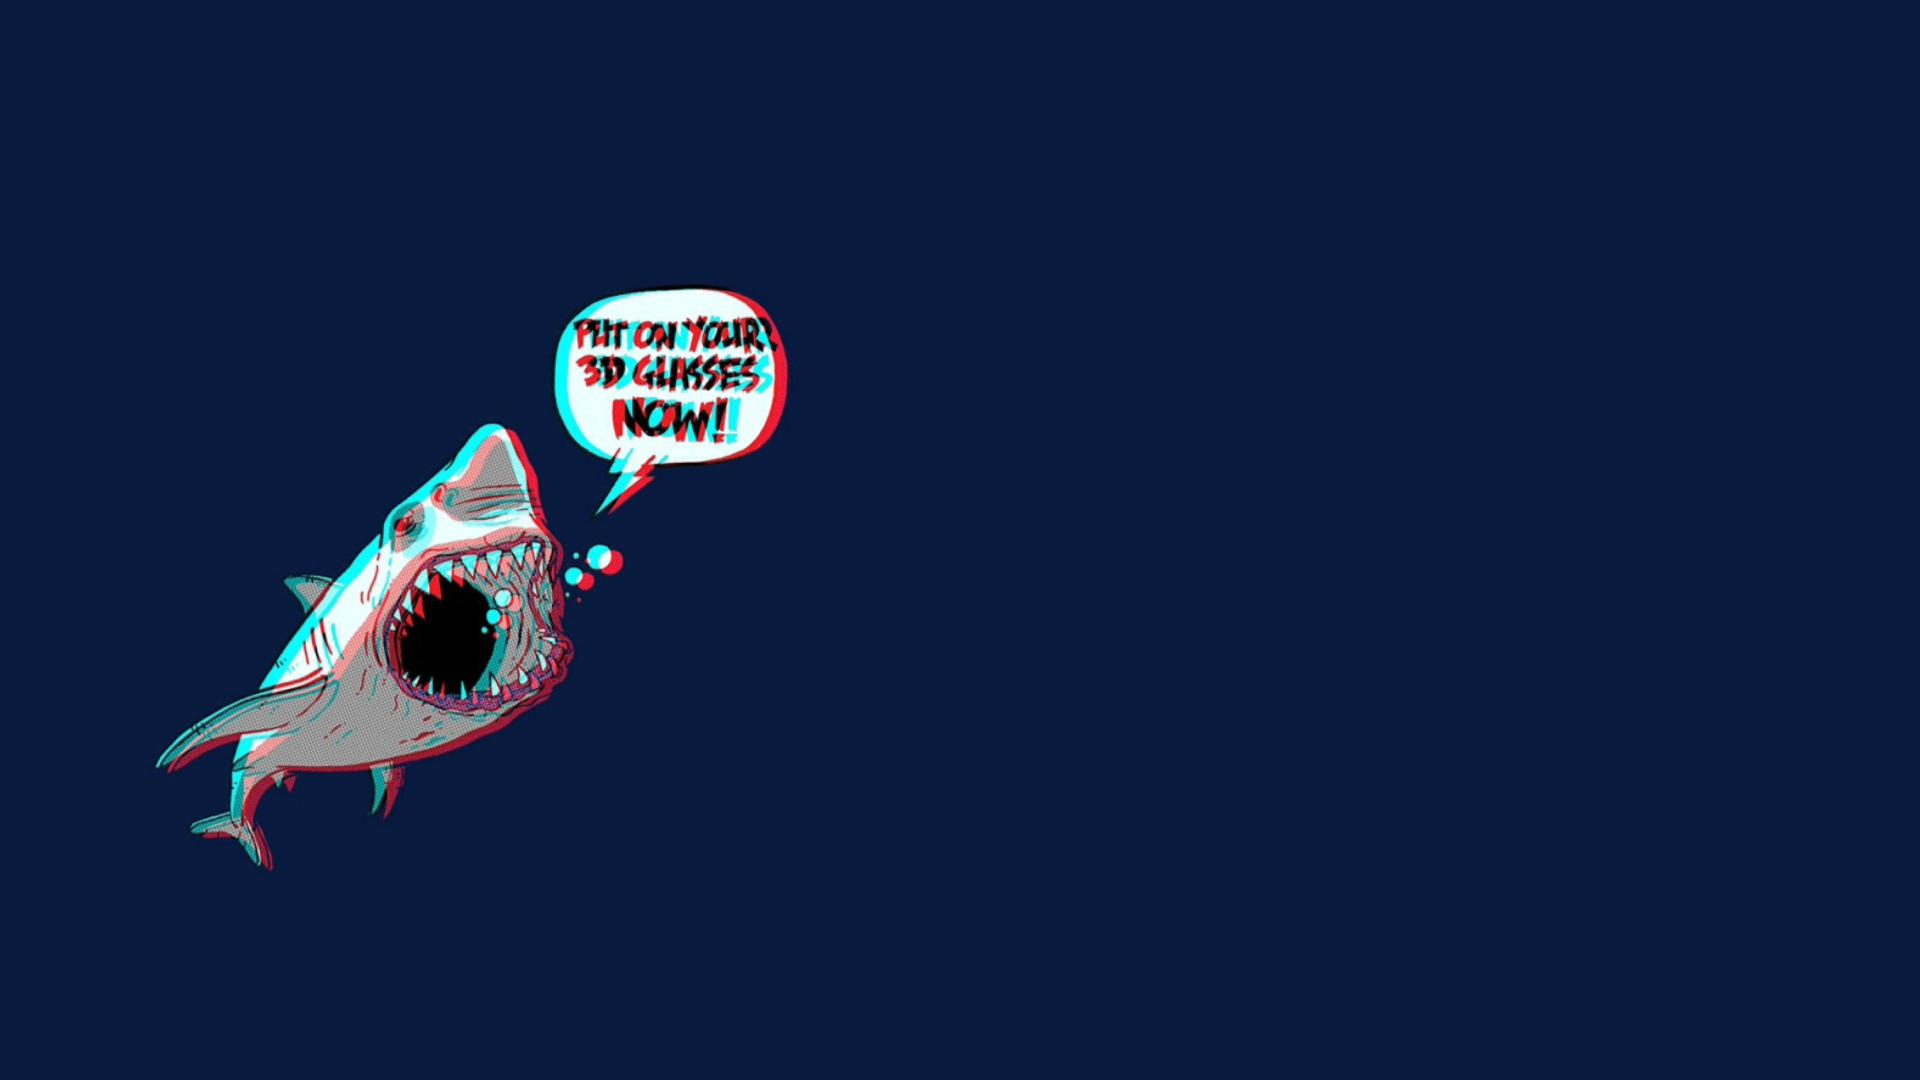 3d shark fondos de pantalla gratis para escritorio for Imagenes fondo 3d